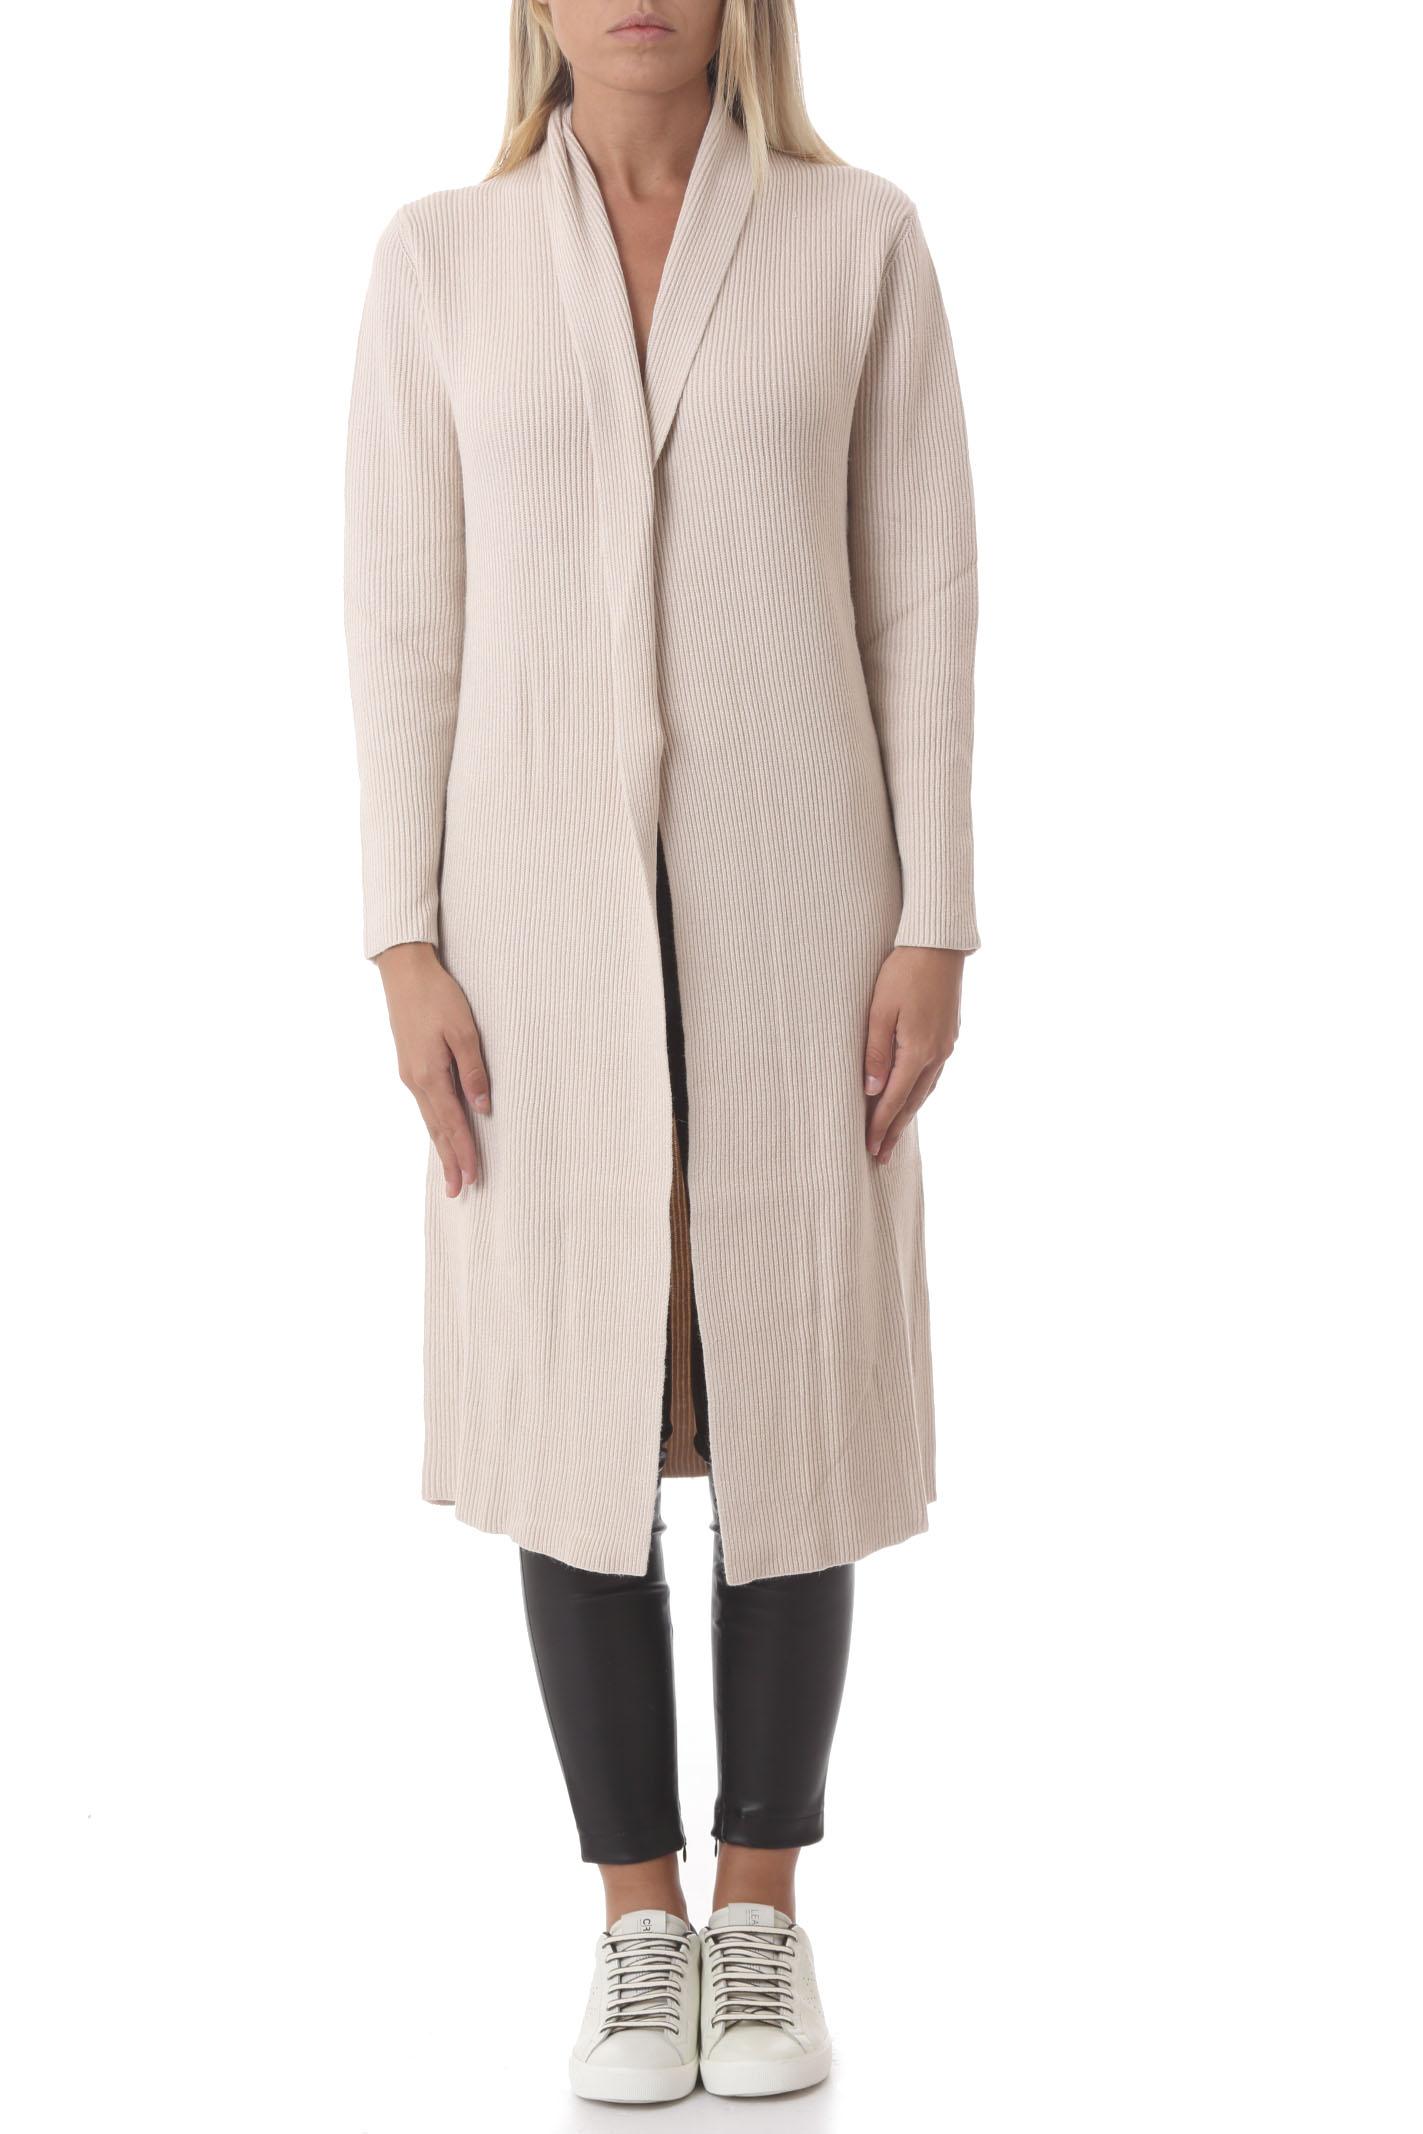 Giacca in lana donna KAOS | Maglie | NIBPT0181018